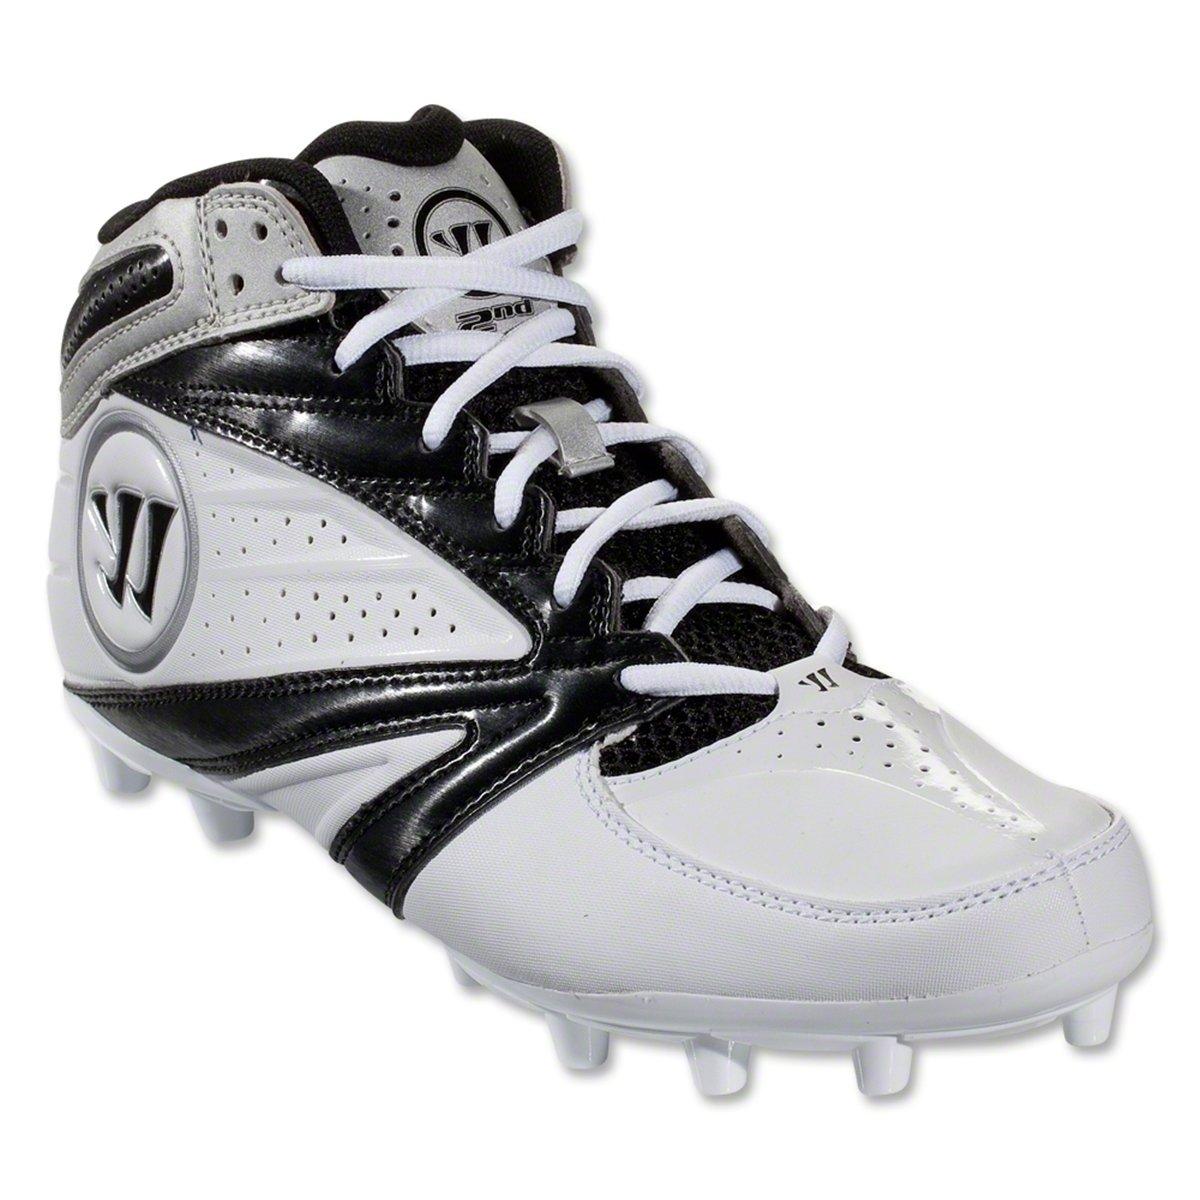 Warrior Men's 2nd Degree 3 Lacrosse Shoe B00F15ELJA 9.5 D(M) US White/Black